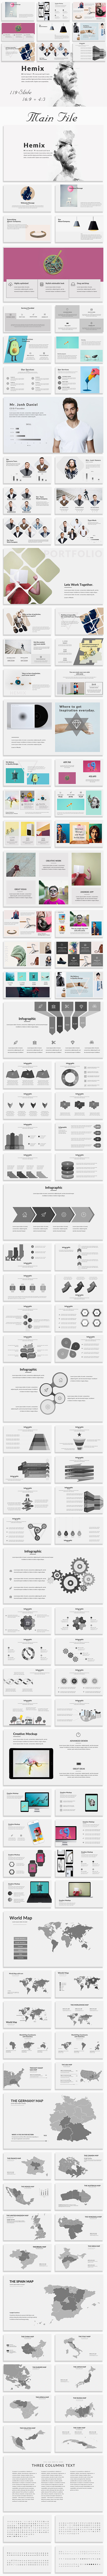 GraphicRiver Hemix Minimal PowerPoint Template 20478142